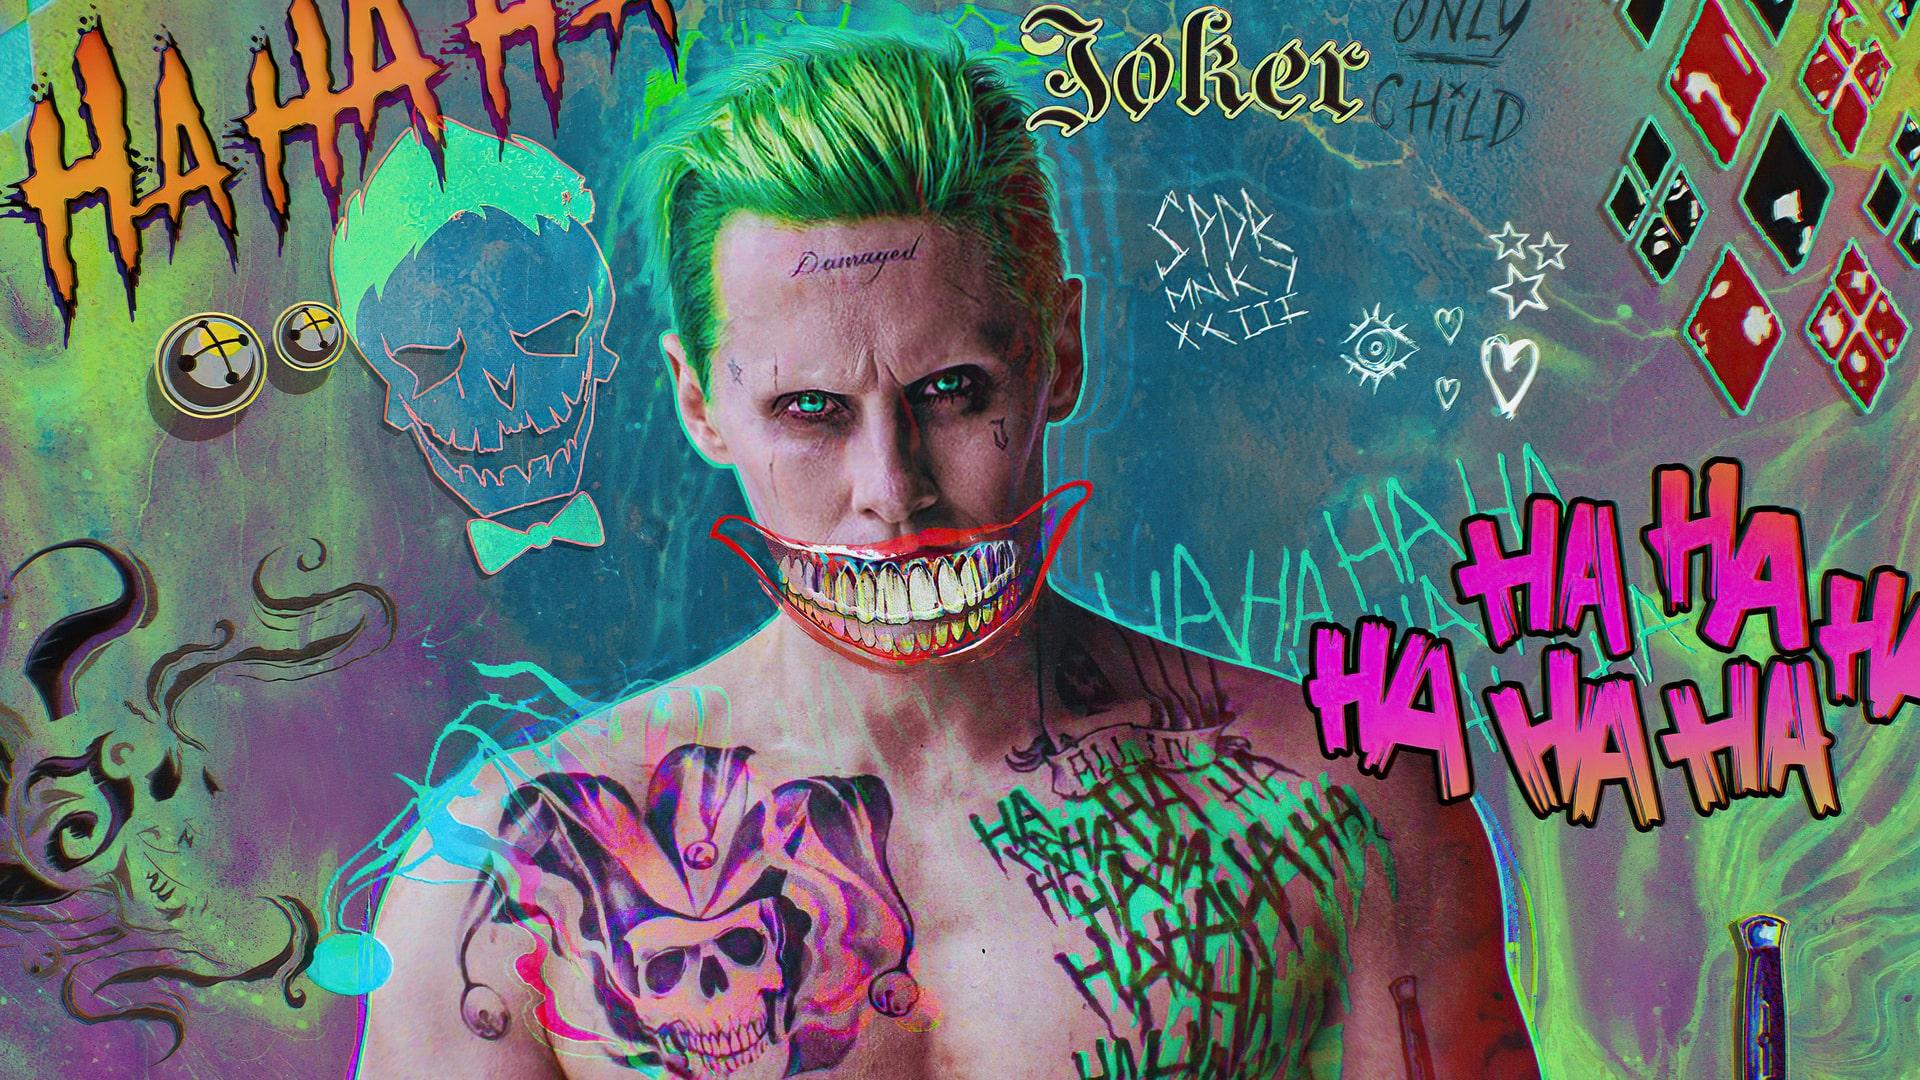 joker wallpaper, wallpaper, hd wallpaper